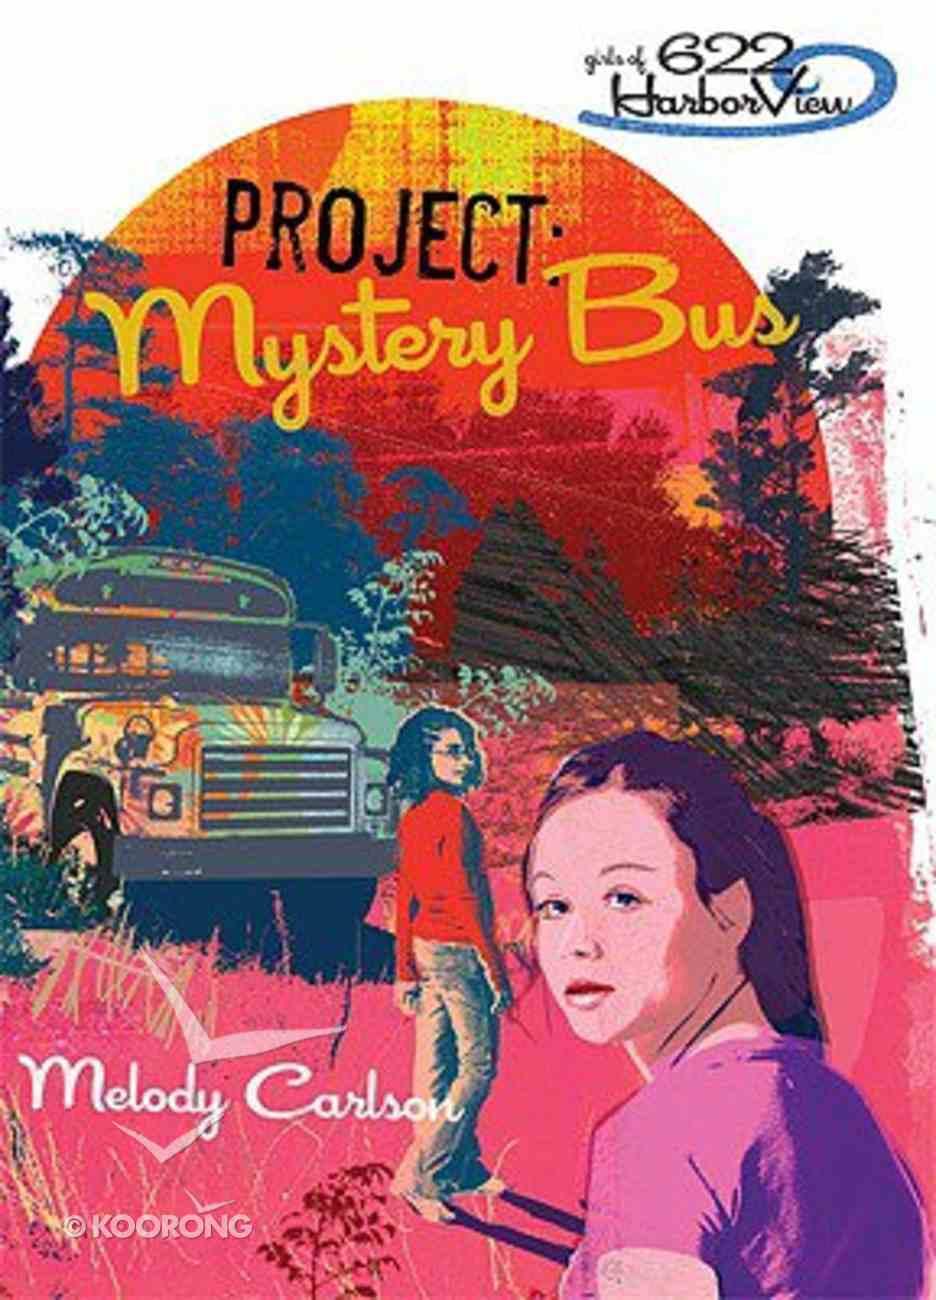 Faithgirlz! Girls of 622 Harbor View #02: Project Mystery Bus (#02 in Faithgirlz! Harbor View: Project Series) Paperback